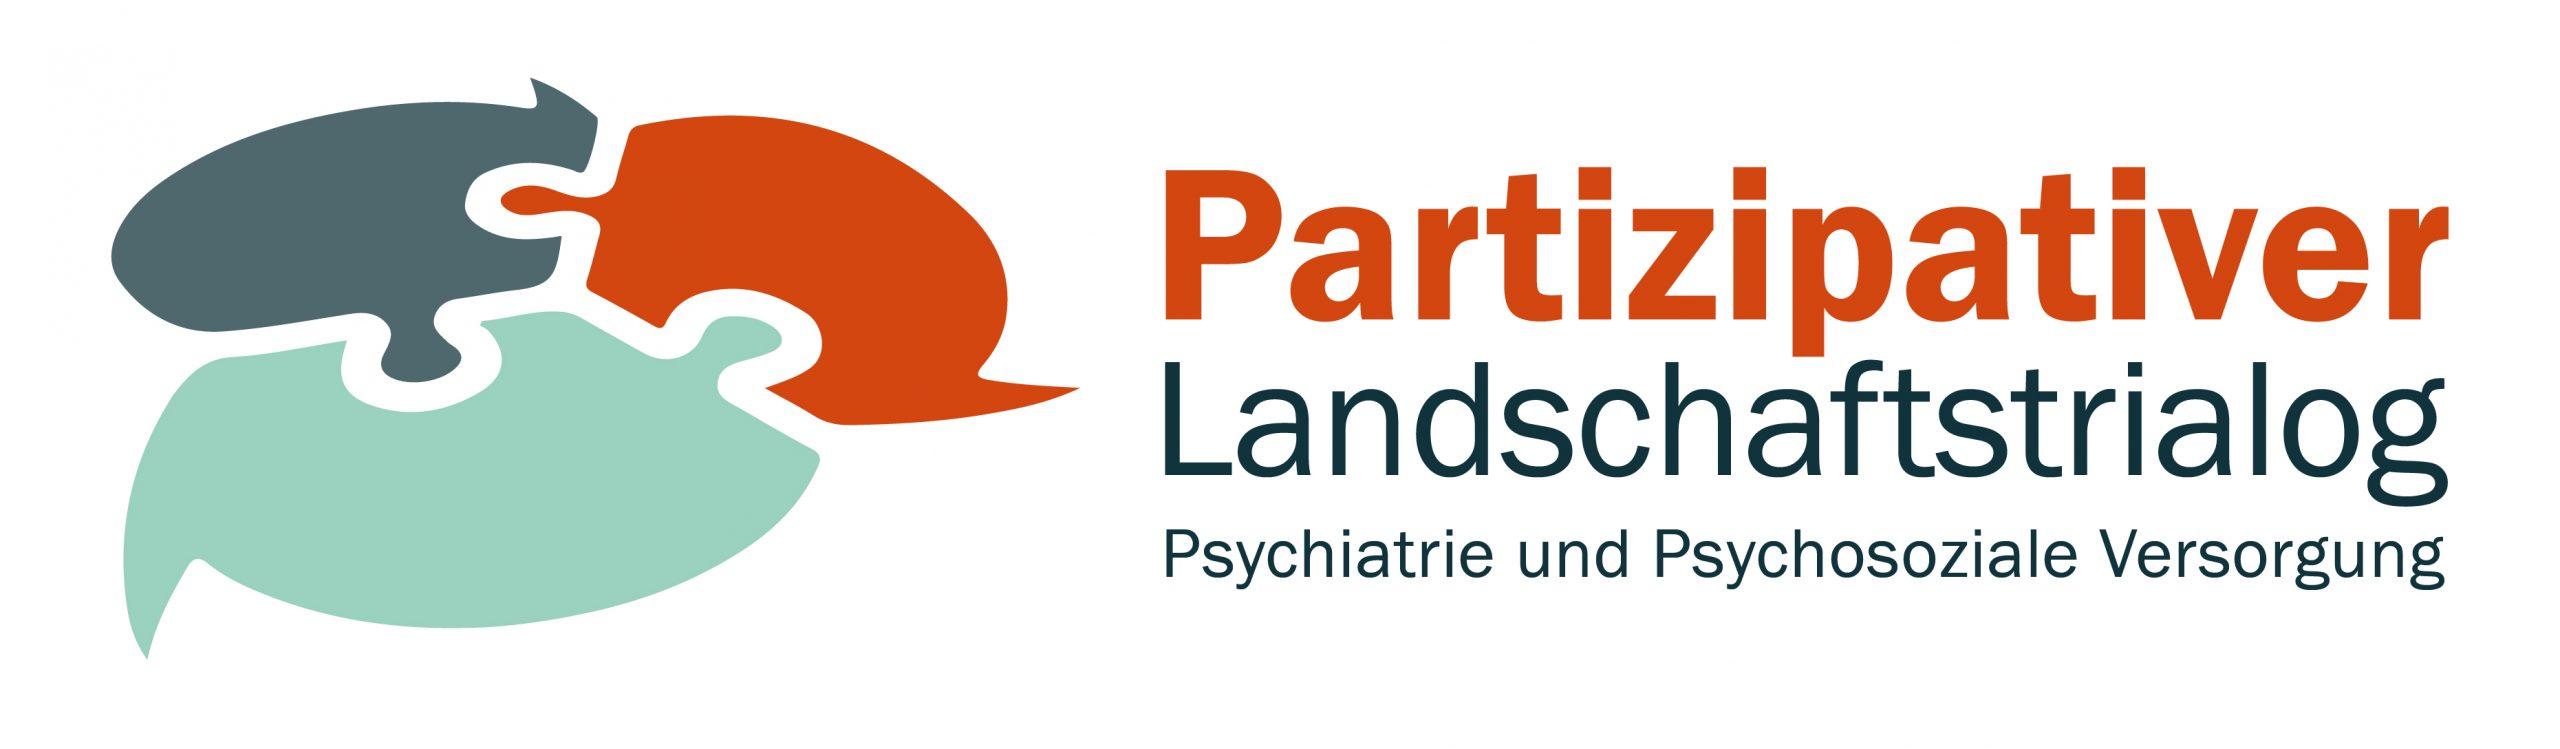 Partizipativer Landschaftstrialog